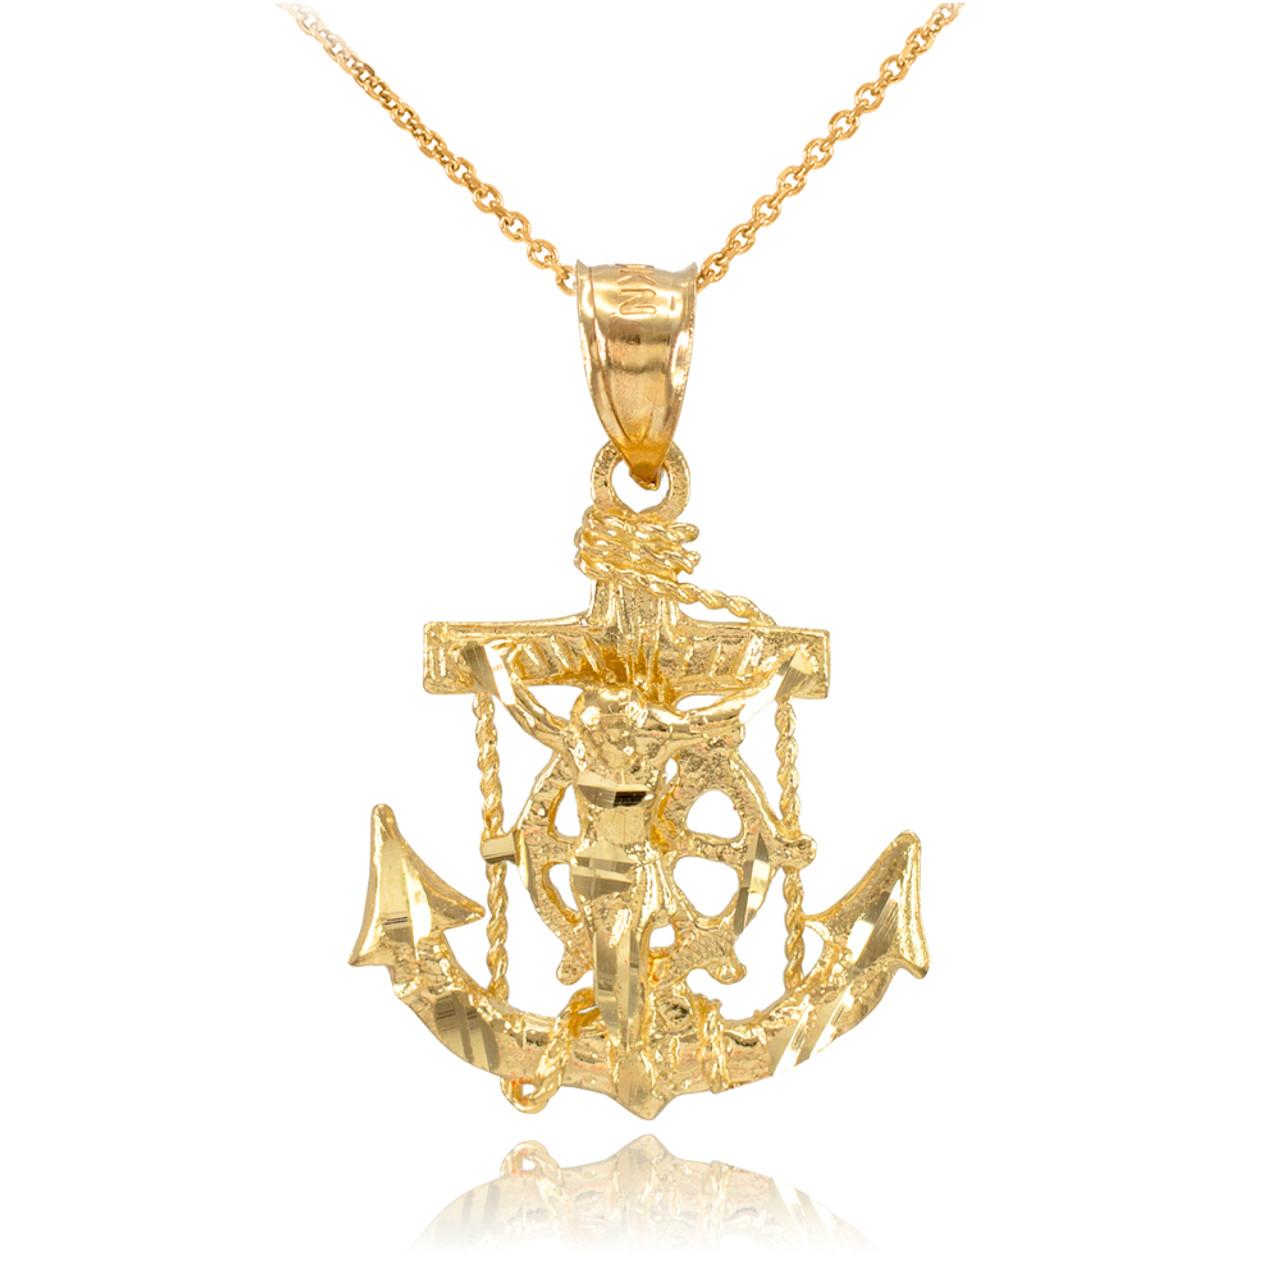 Gold mariner crucifix anchor cross pendant necklace gold mariners gold mariner crucifix anchor cross pendant necklace aloadofball Image collections